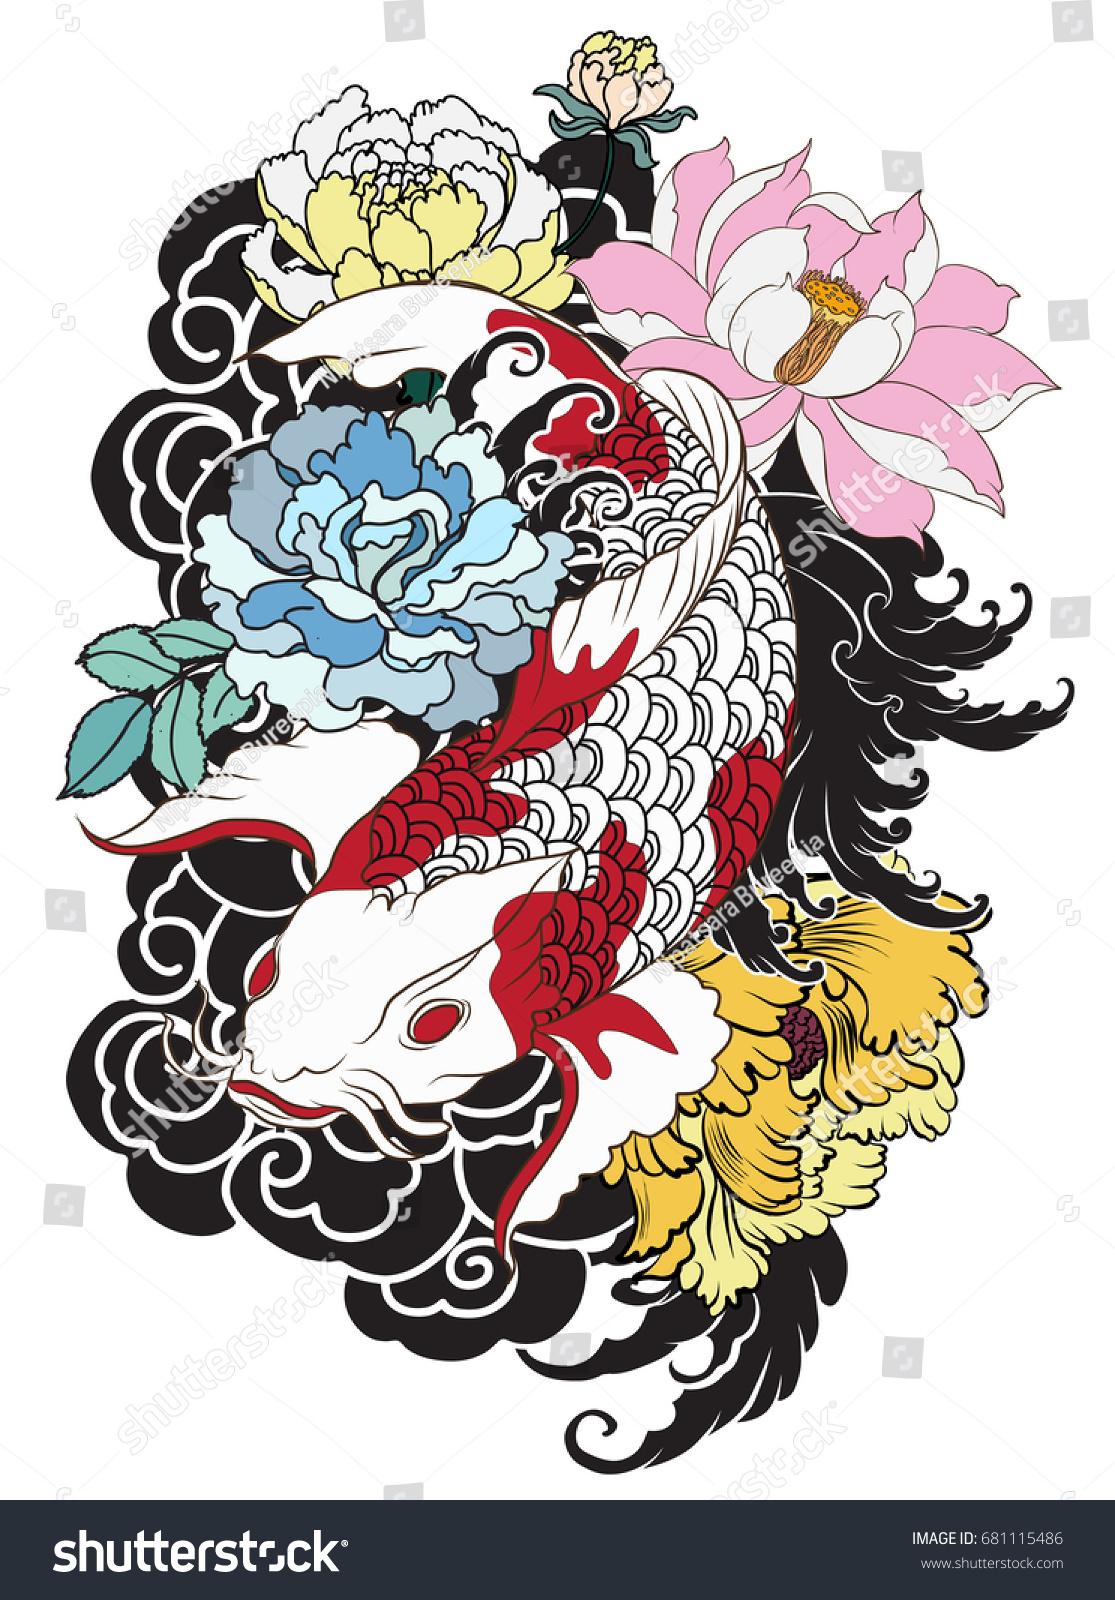 Hand drawn koi fish flower tattoo stock vector 681115486 shutterstock hand drawn koi fish with flower tattoo for armlorful koi carp with water splash izmirmasajfo